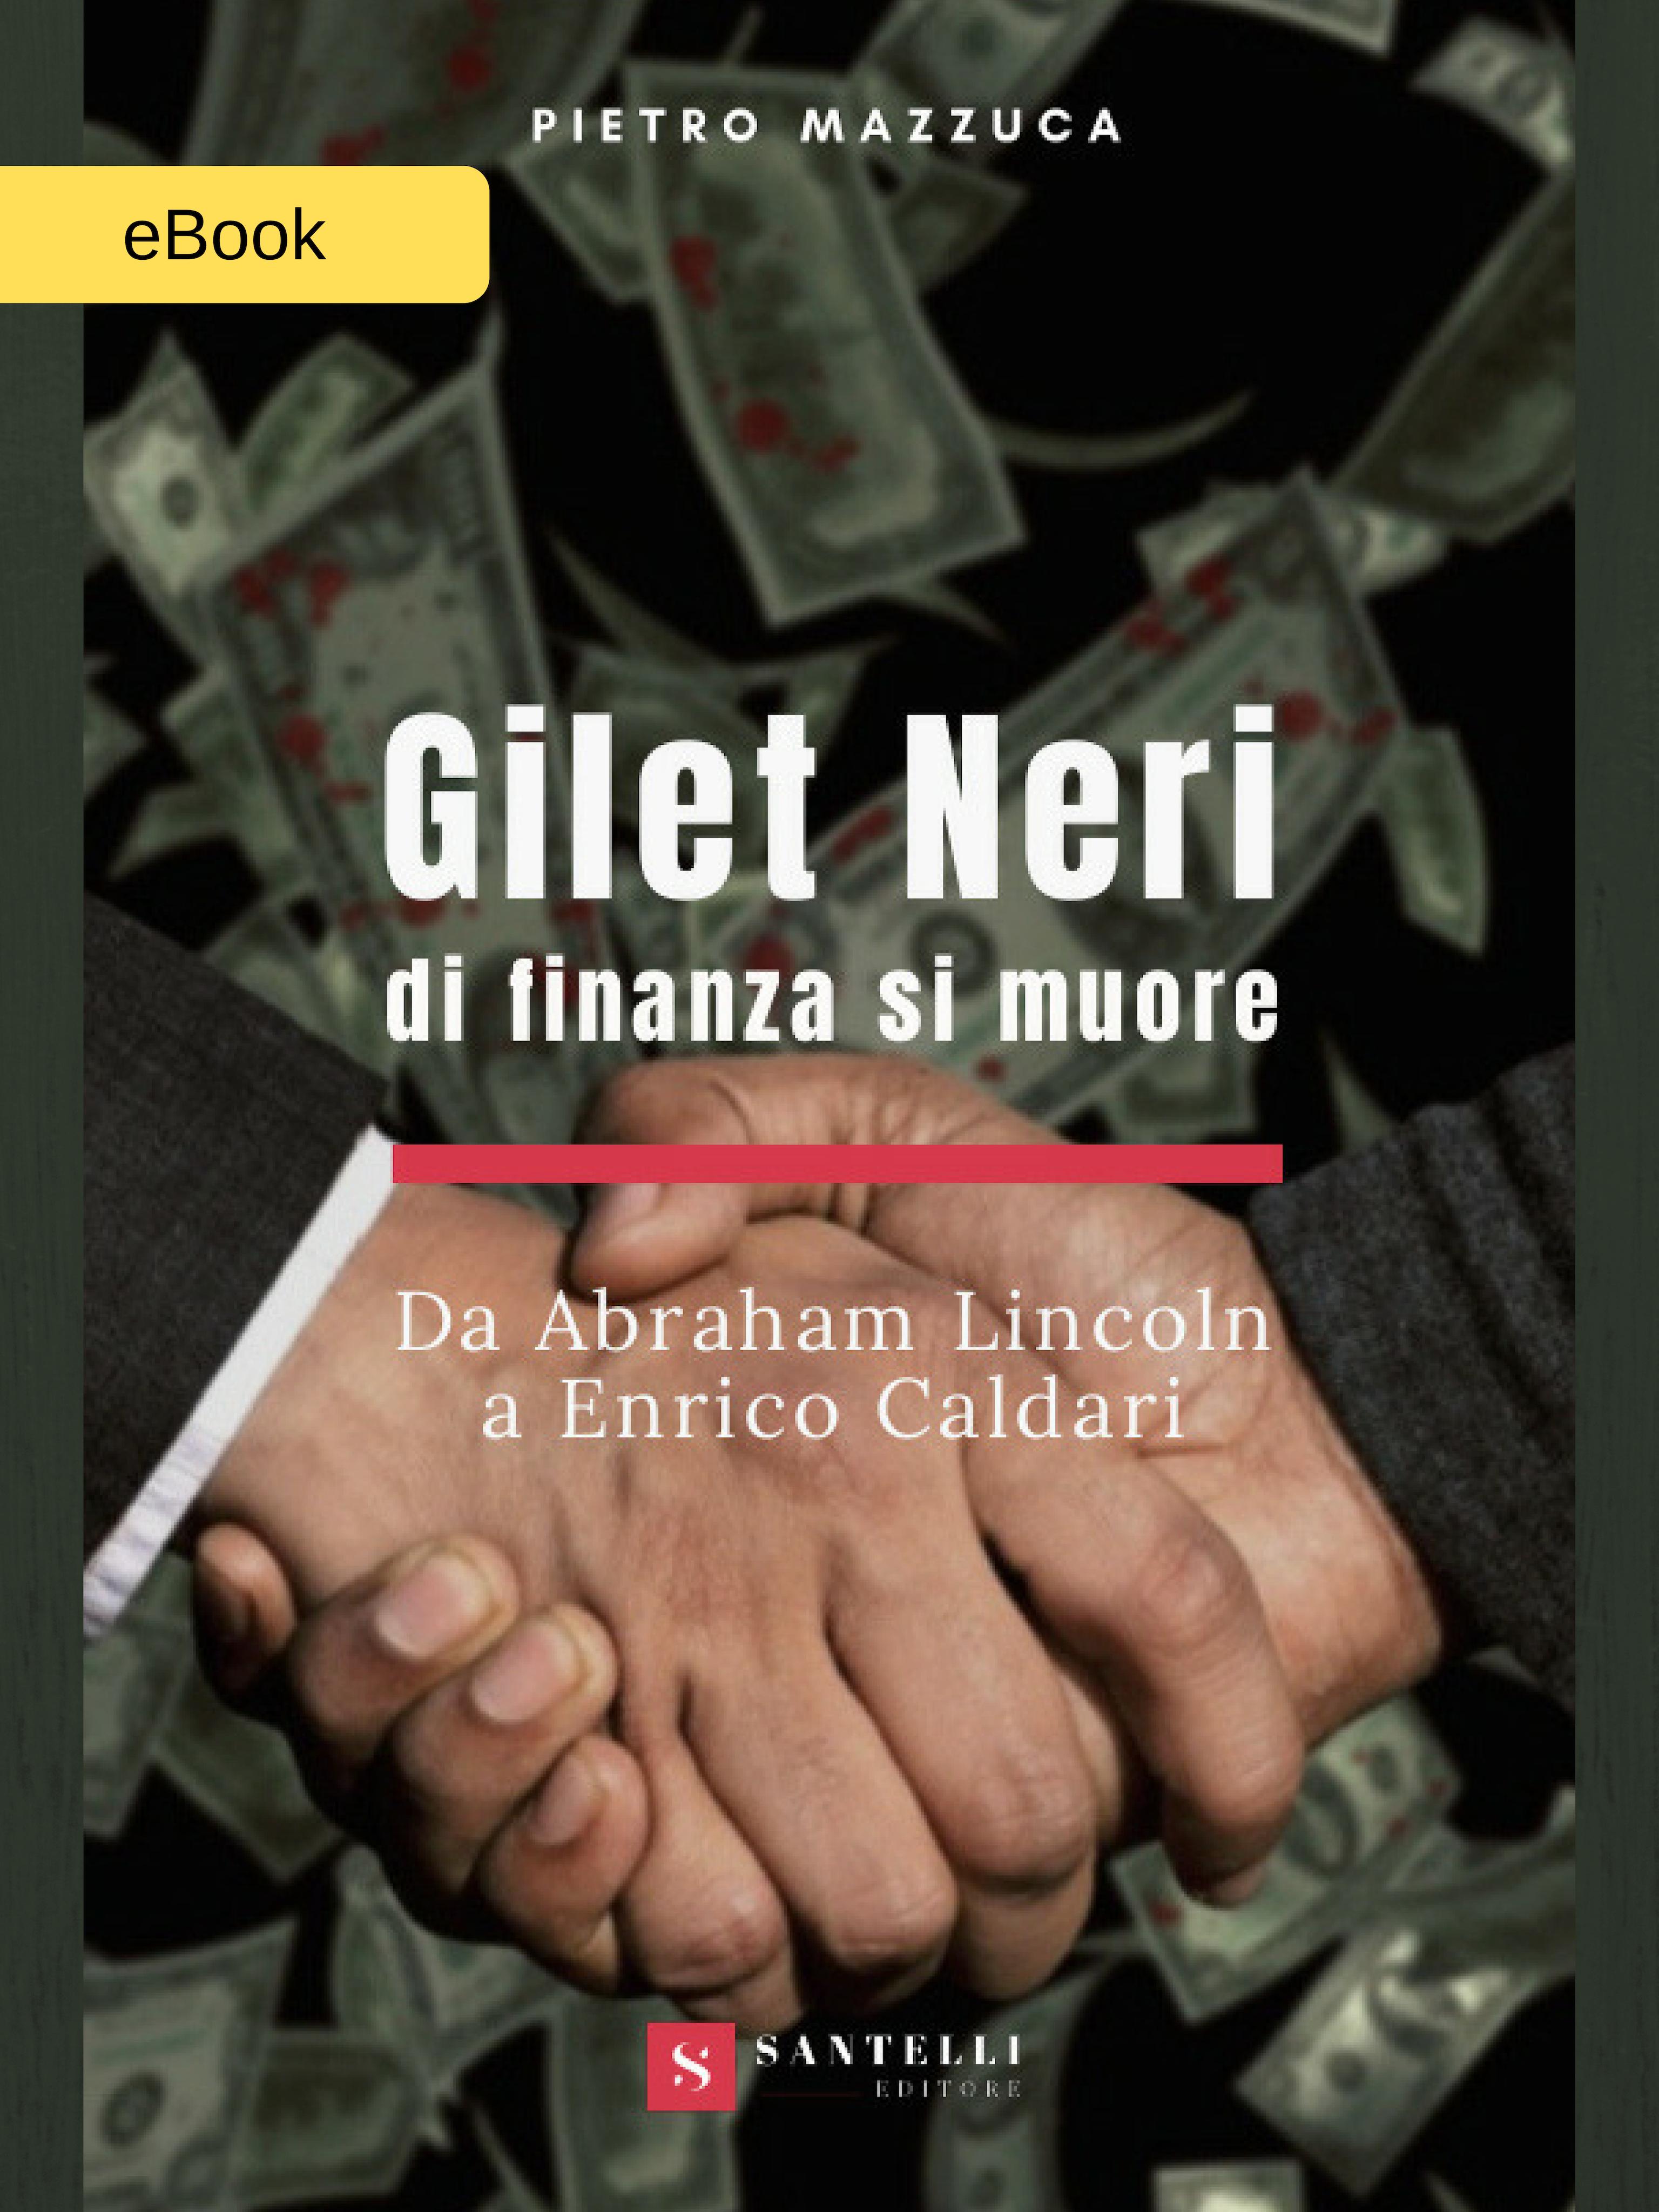 Gilet neri (eBook), Pietro Mazzuca - coverfront